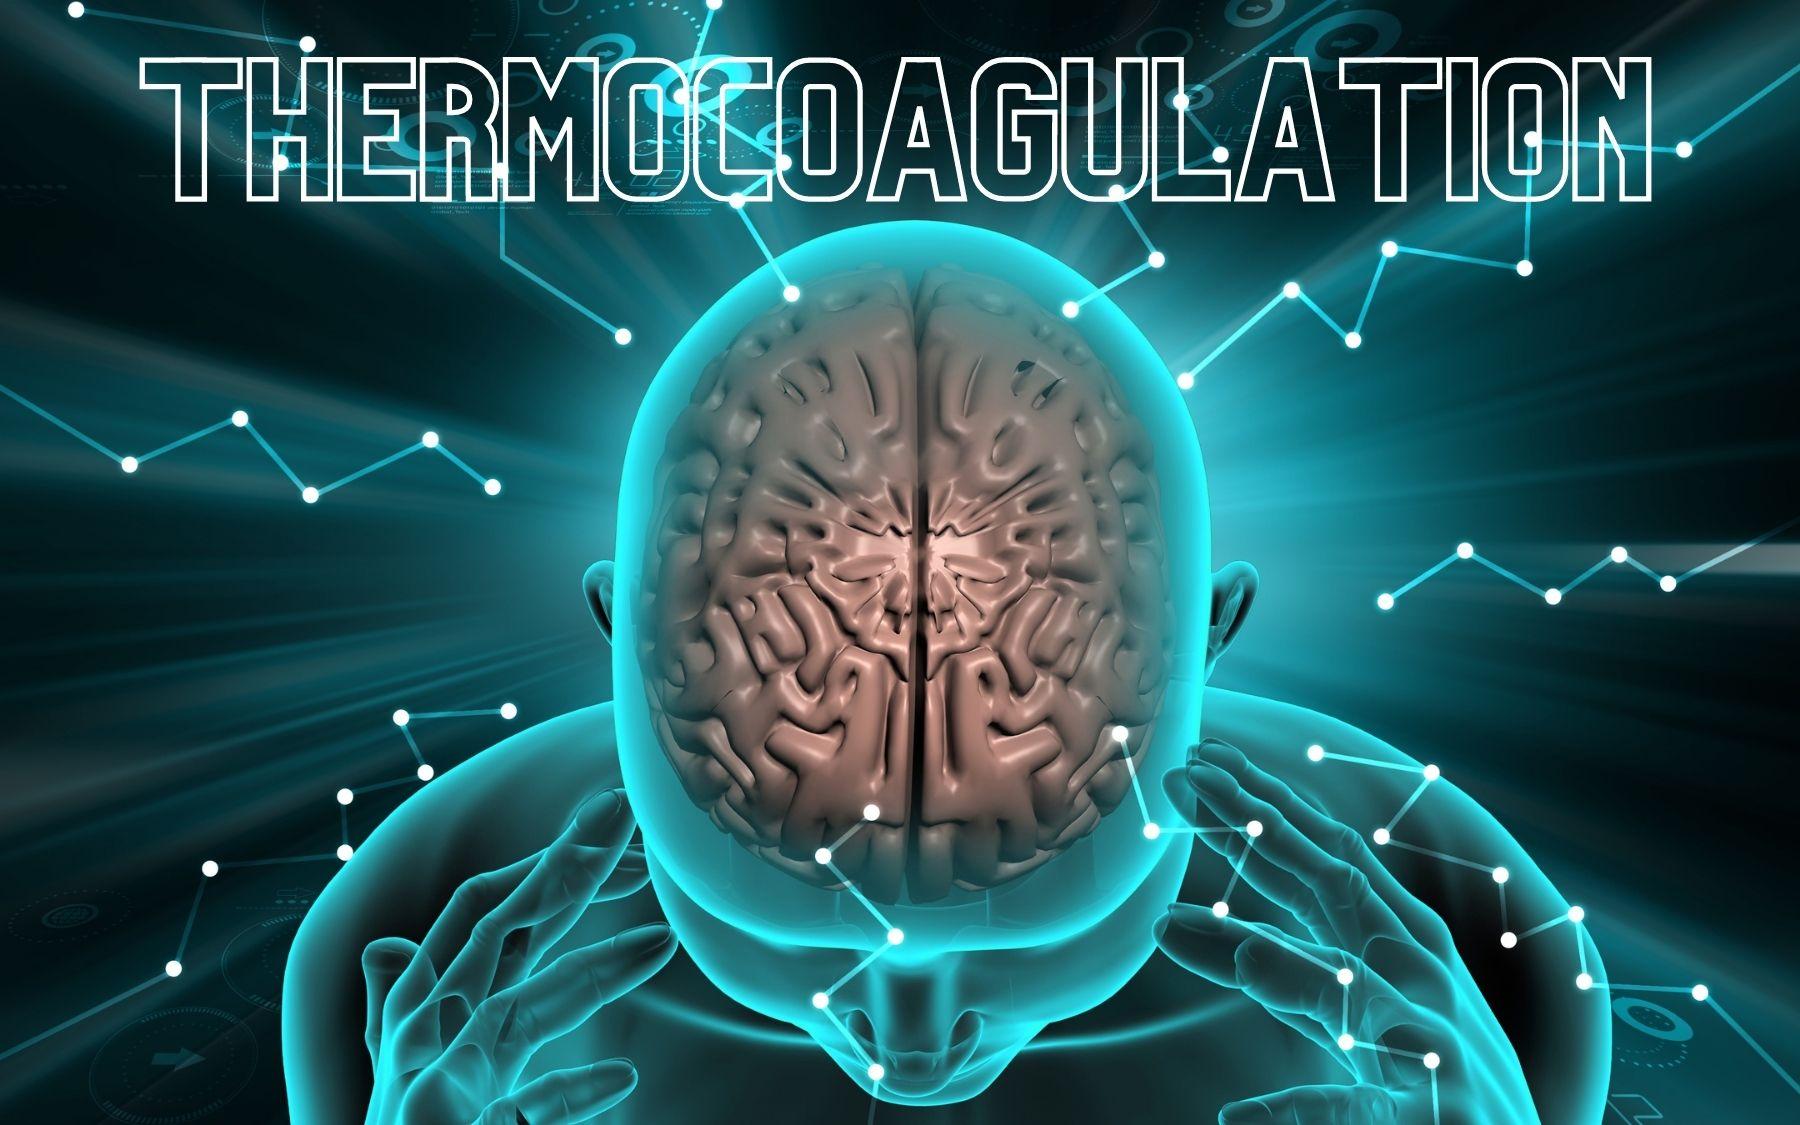 Thermocoagulation